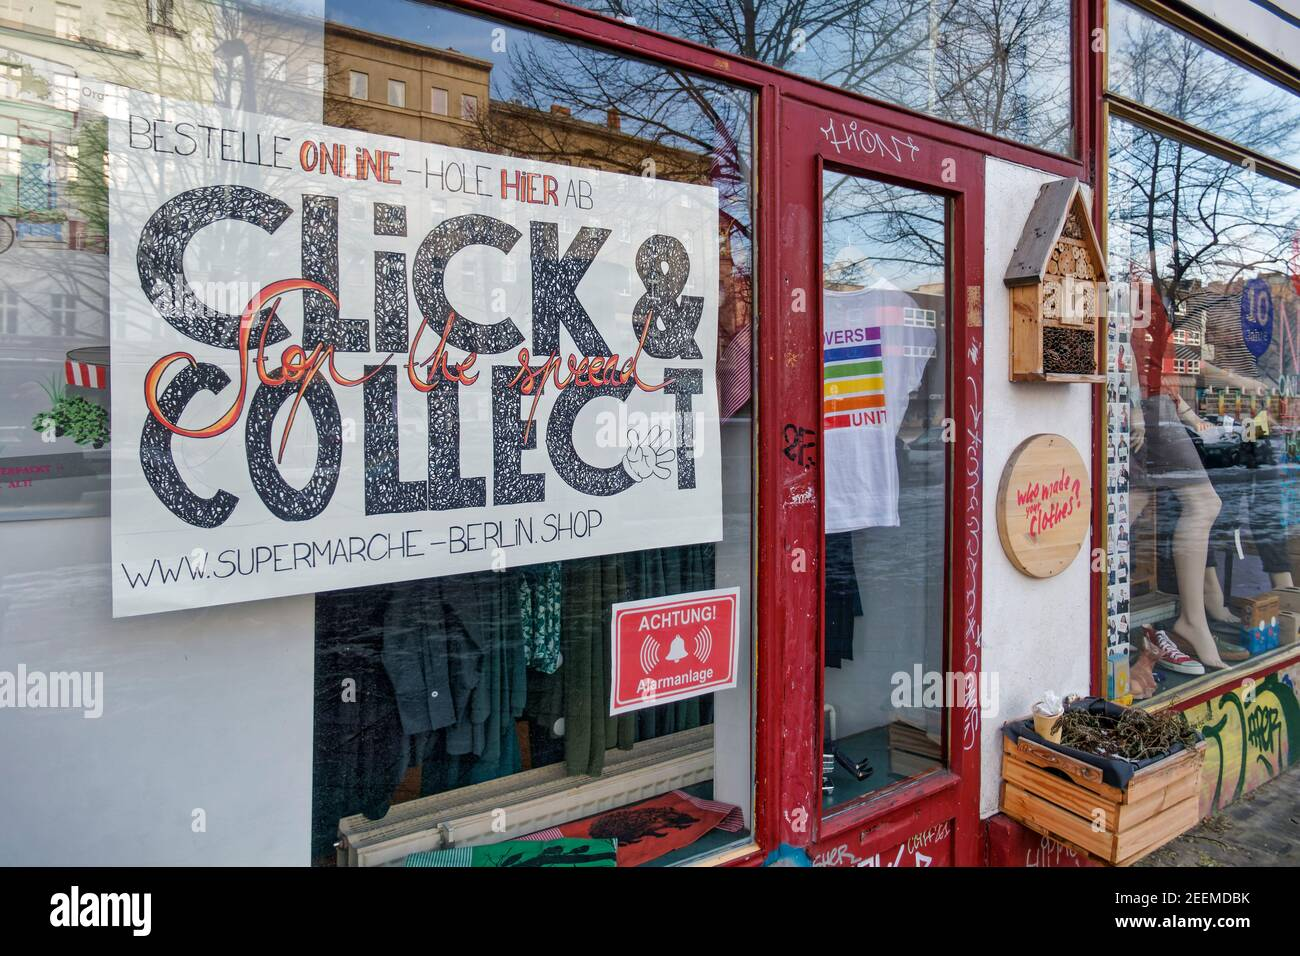 Lockdown Januar 2021, Click & Collect, Abholung im Laden , Fair fashion,  Supermarche, Wienerstrasse, Kreuzberg, Berlin Stock Photo